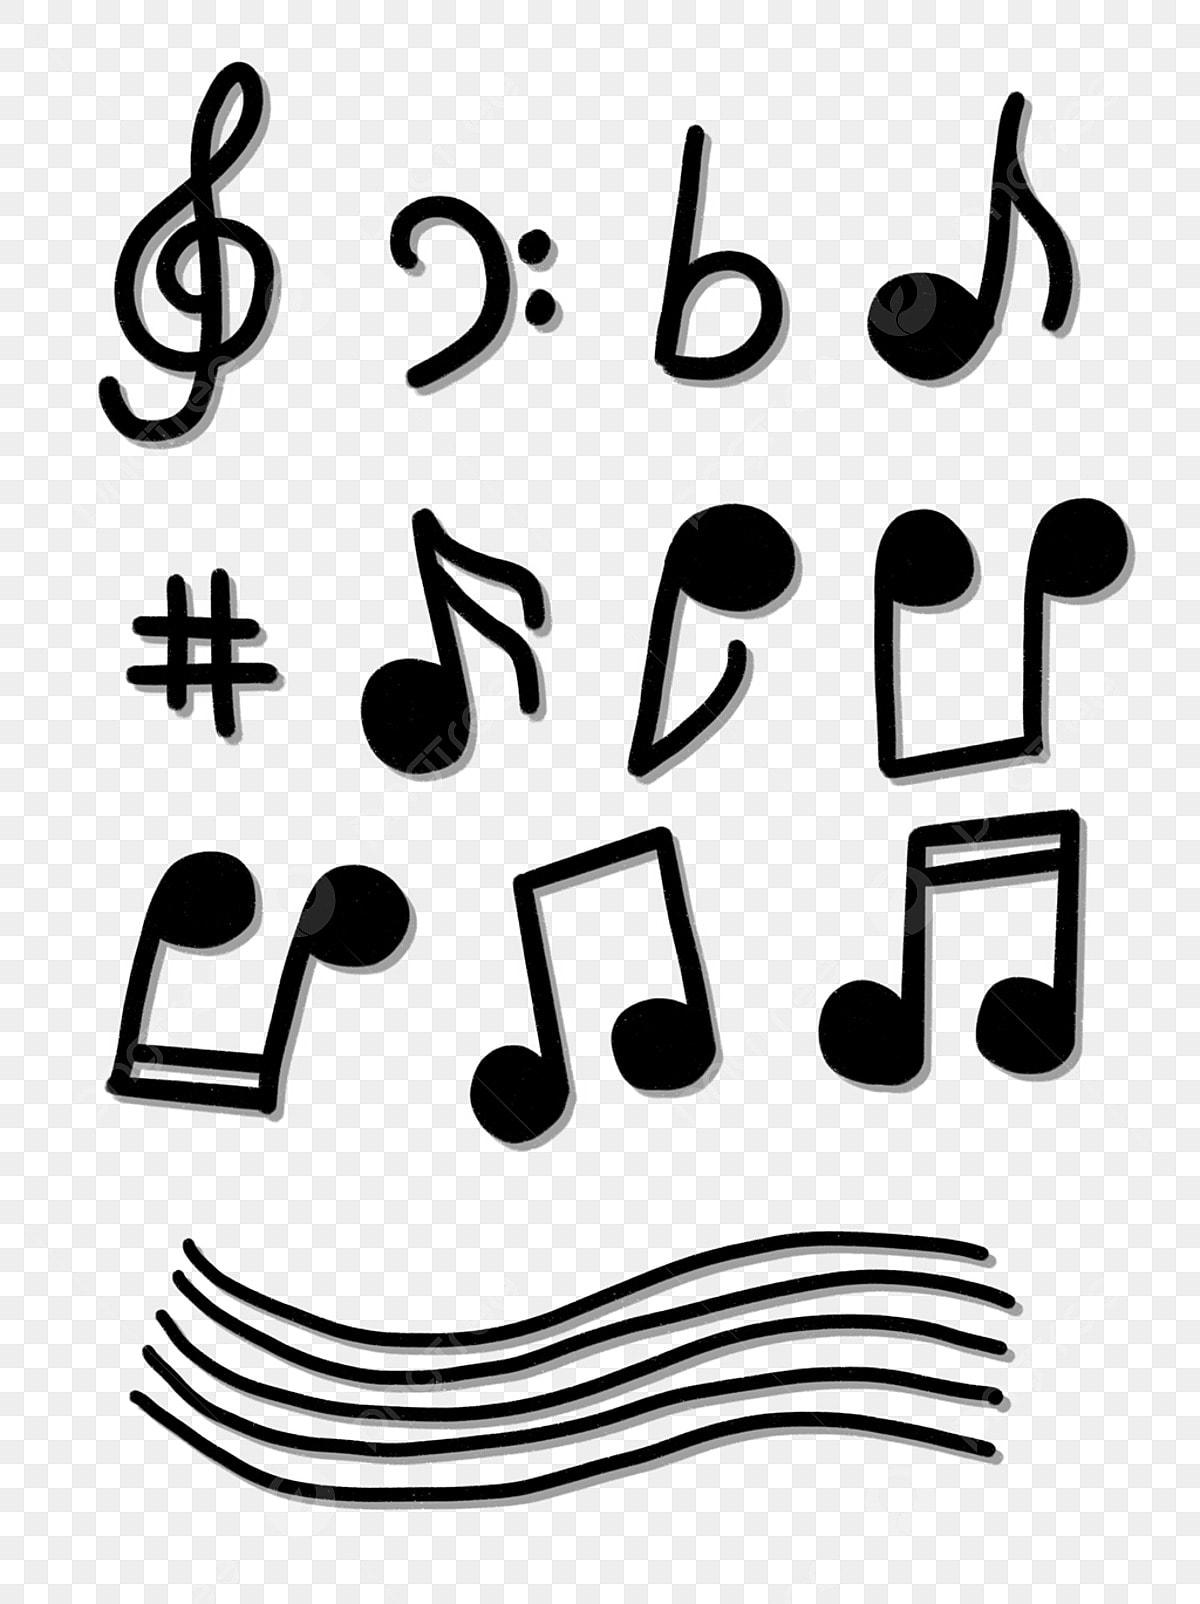 Hand Drawn Cartoon Cute Musical Notes Music Symbols For